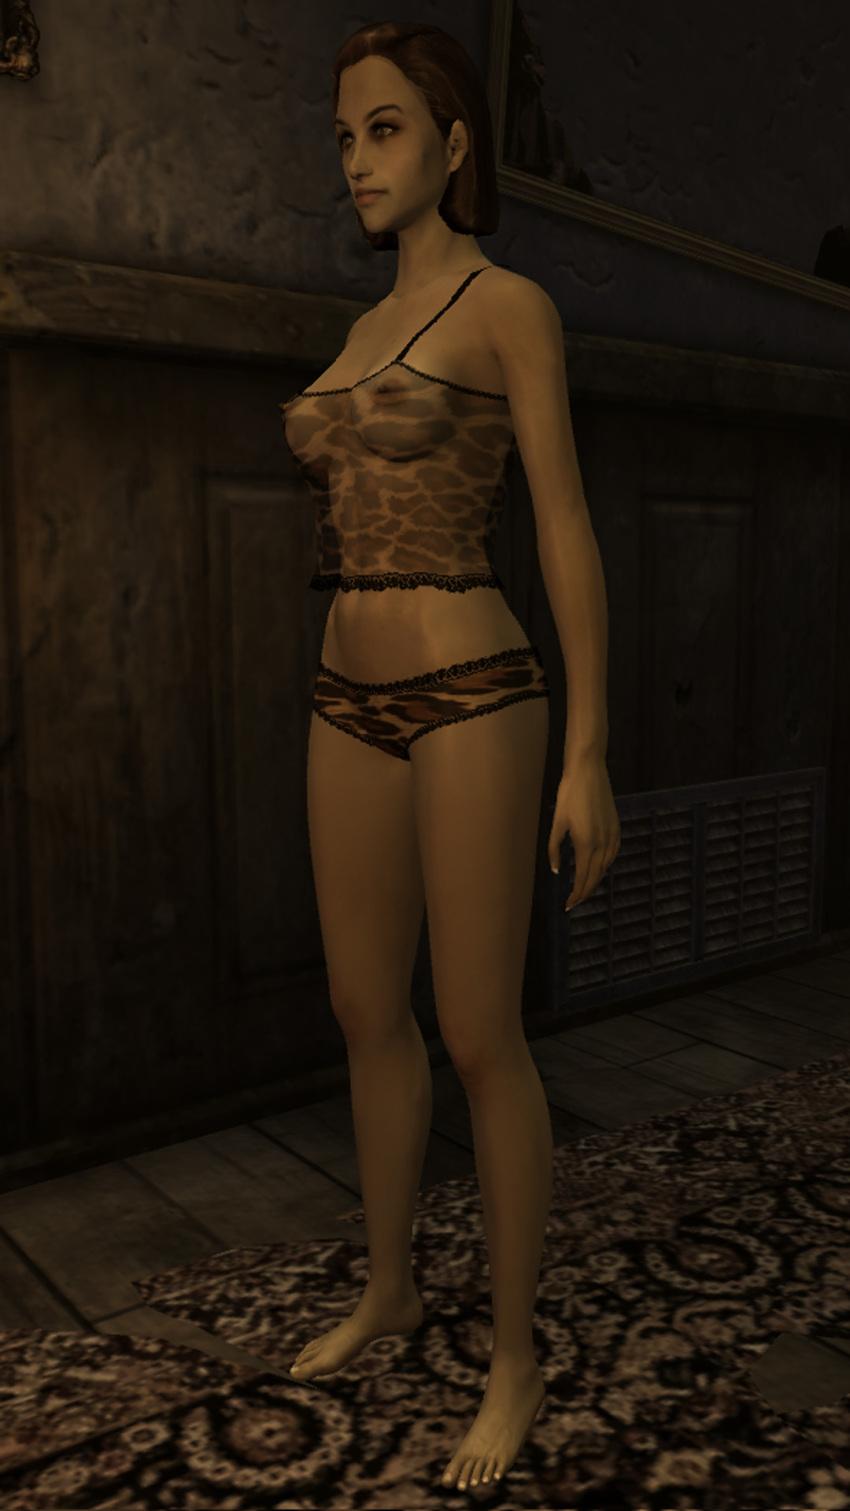 garret new vegas james fallout Elizabeth seven deadly sins nude